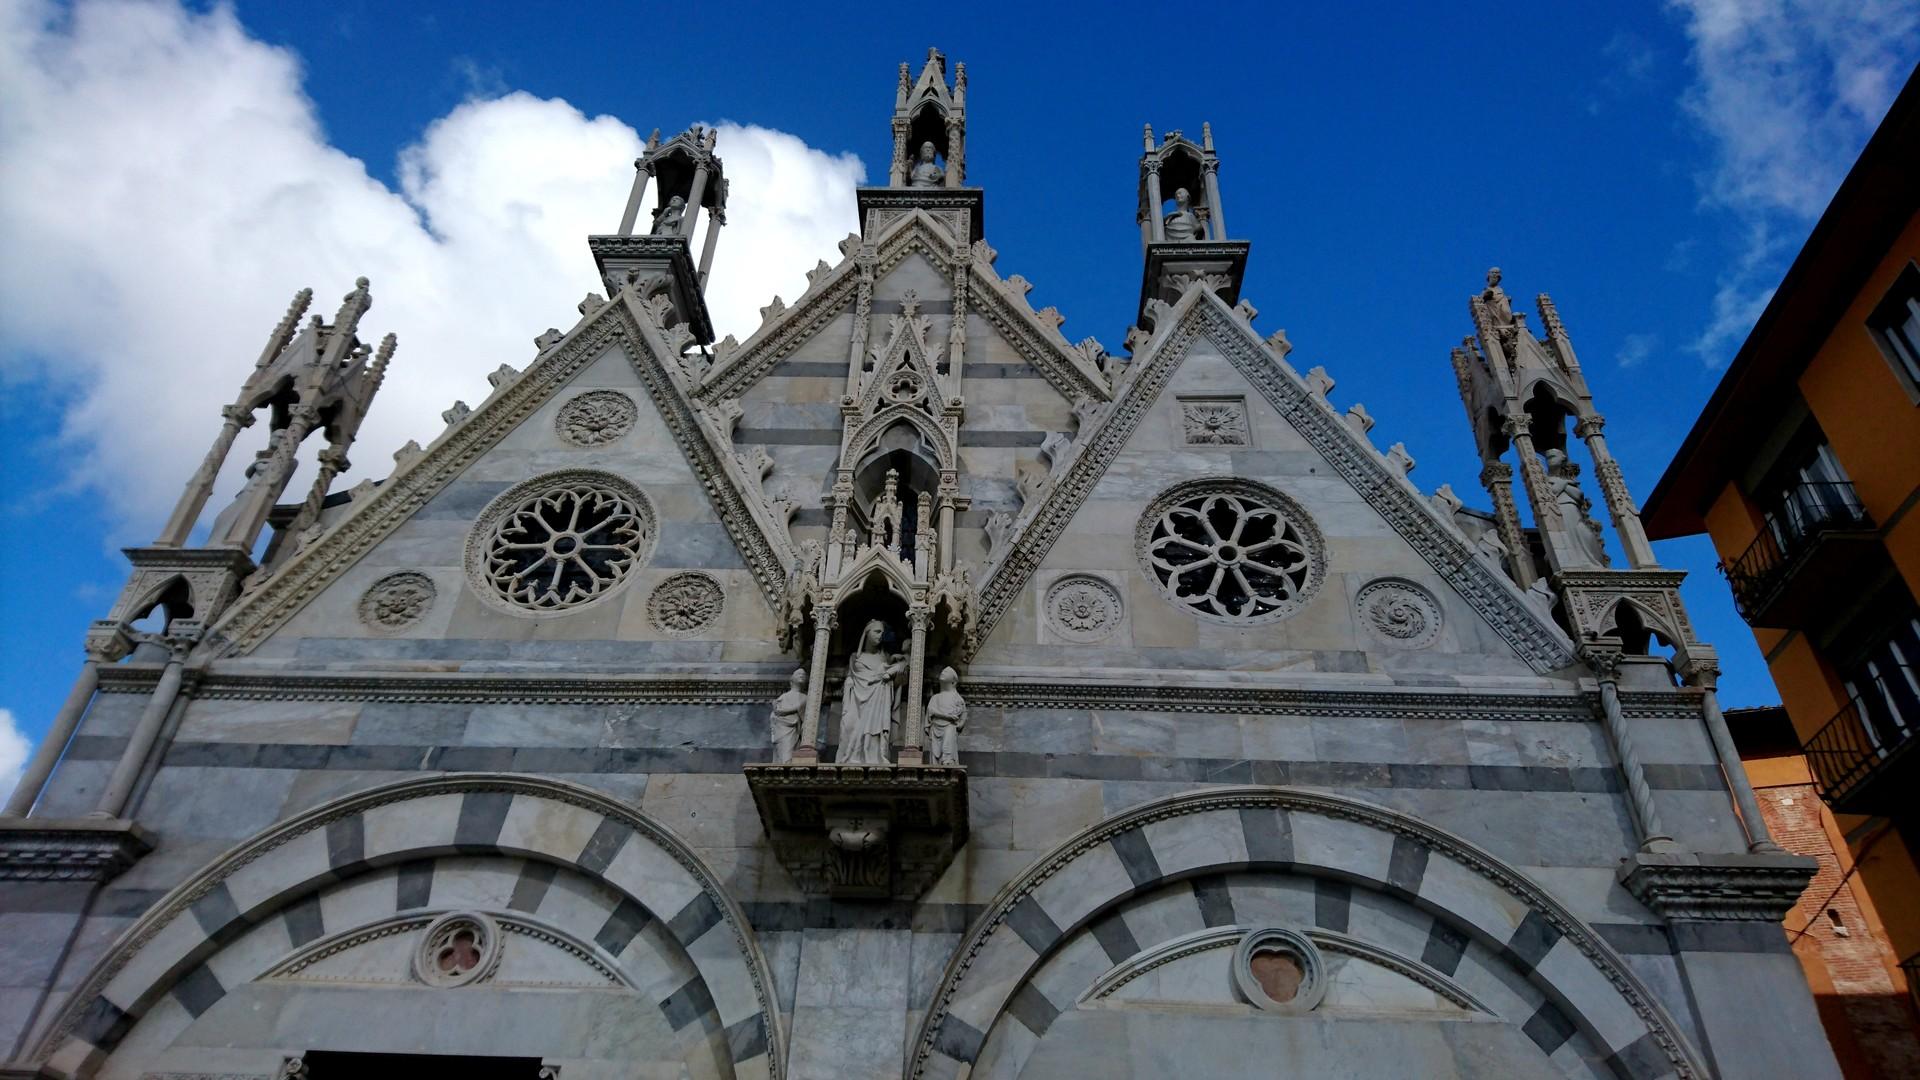 churches-and-their-beauty-fc1f48cab8162b